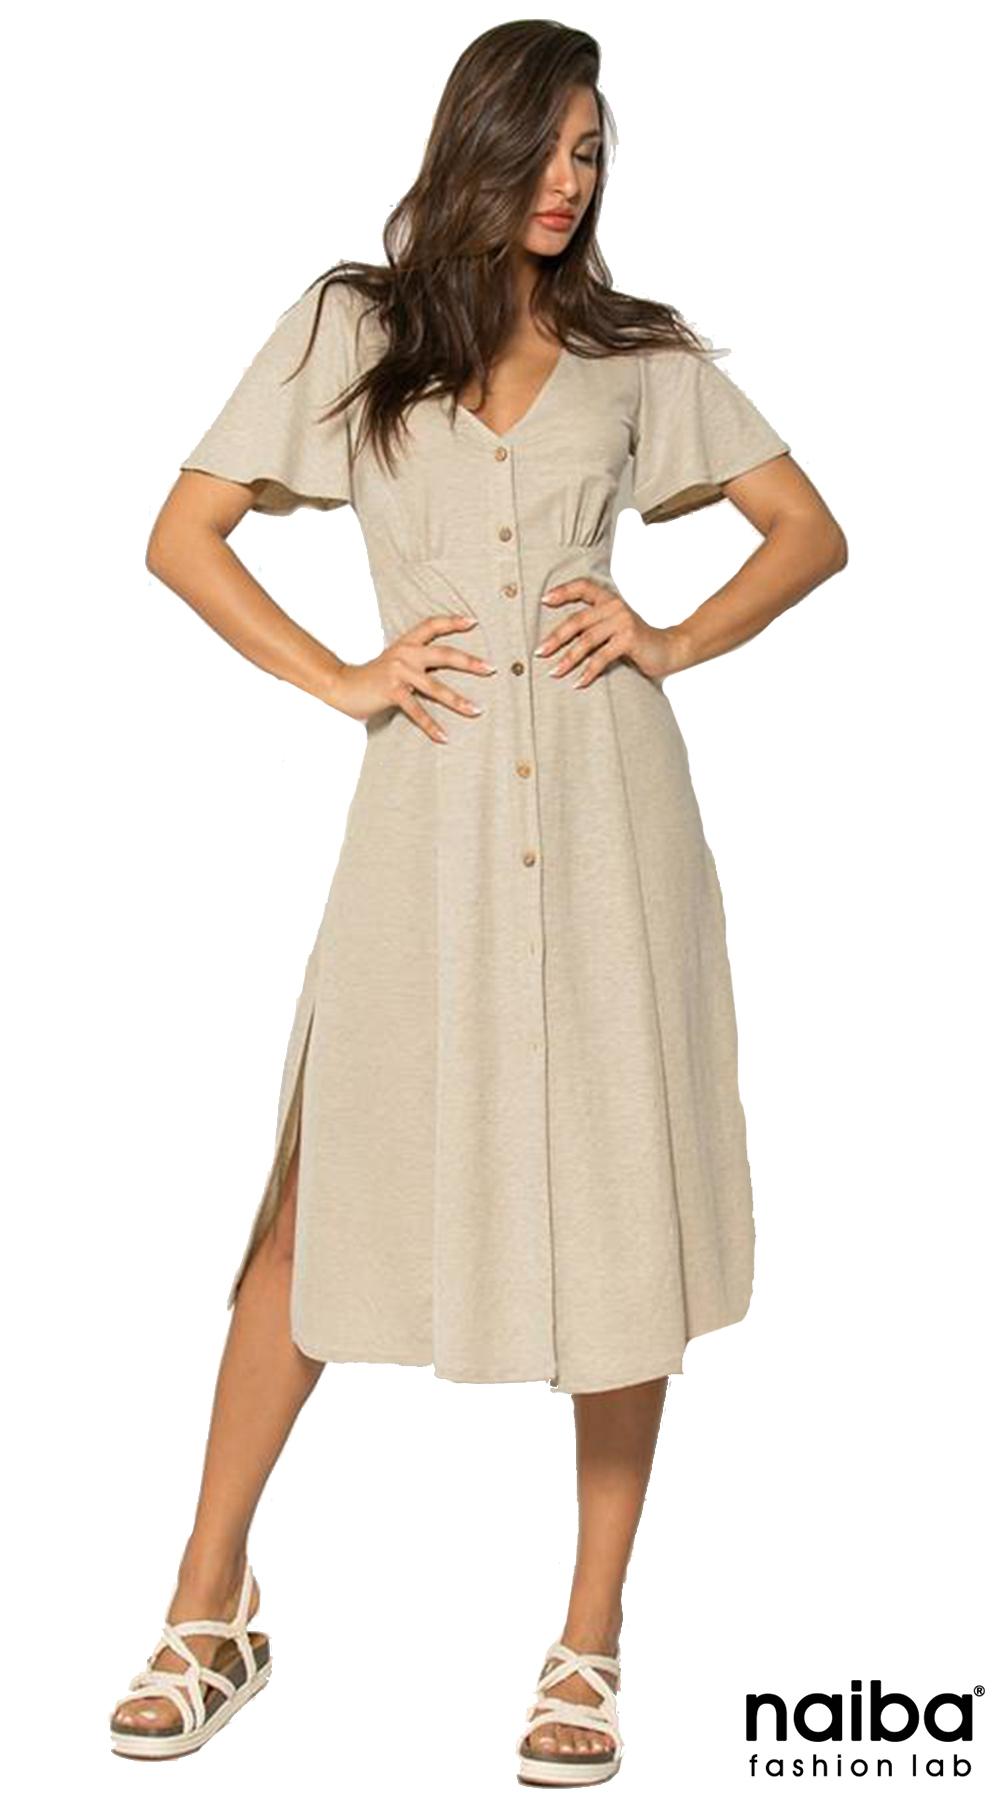 58f9ea888c0f Κοντομάνικο Σεμιζιέ Φόρεμα Visc.με κουμπιά NAIBA